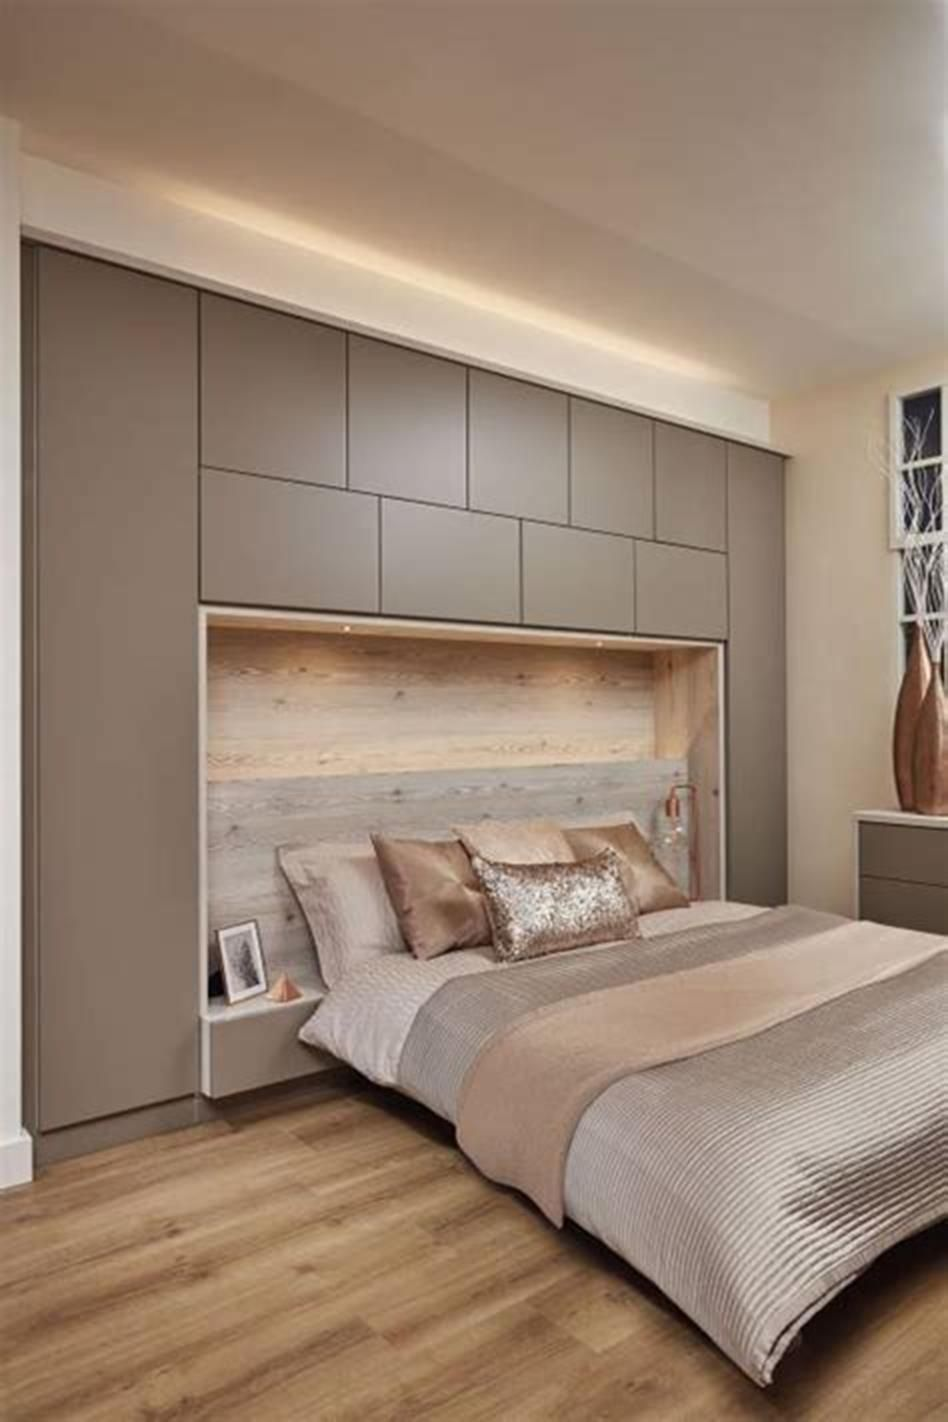 40 Cozy Minimalist Bedroom Decorating Ideas In 2019 57 Viral Decoration Bedroom Interior Simple Bedroom Home Decor Bedroom